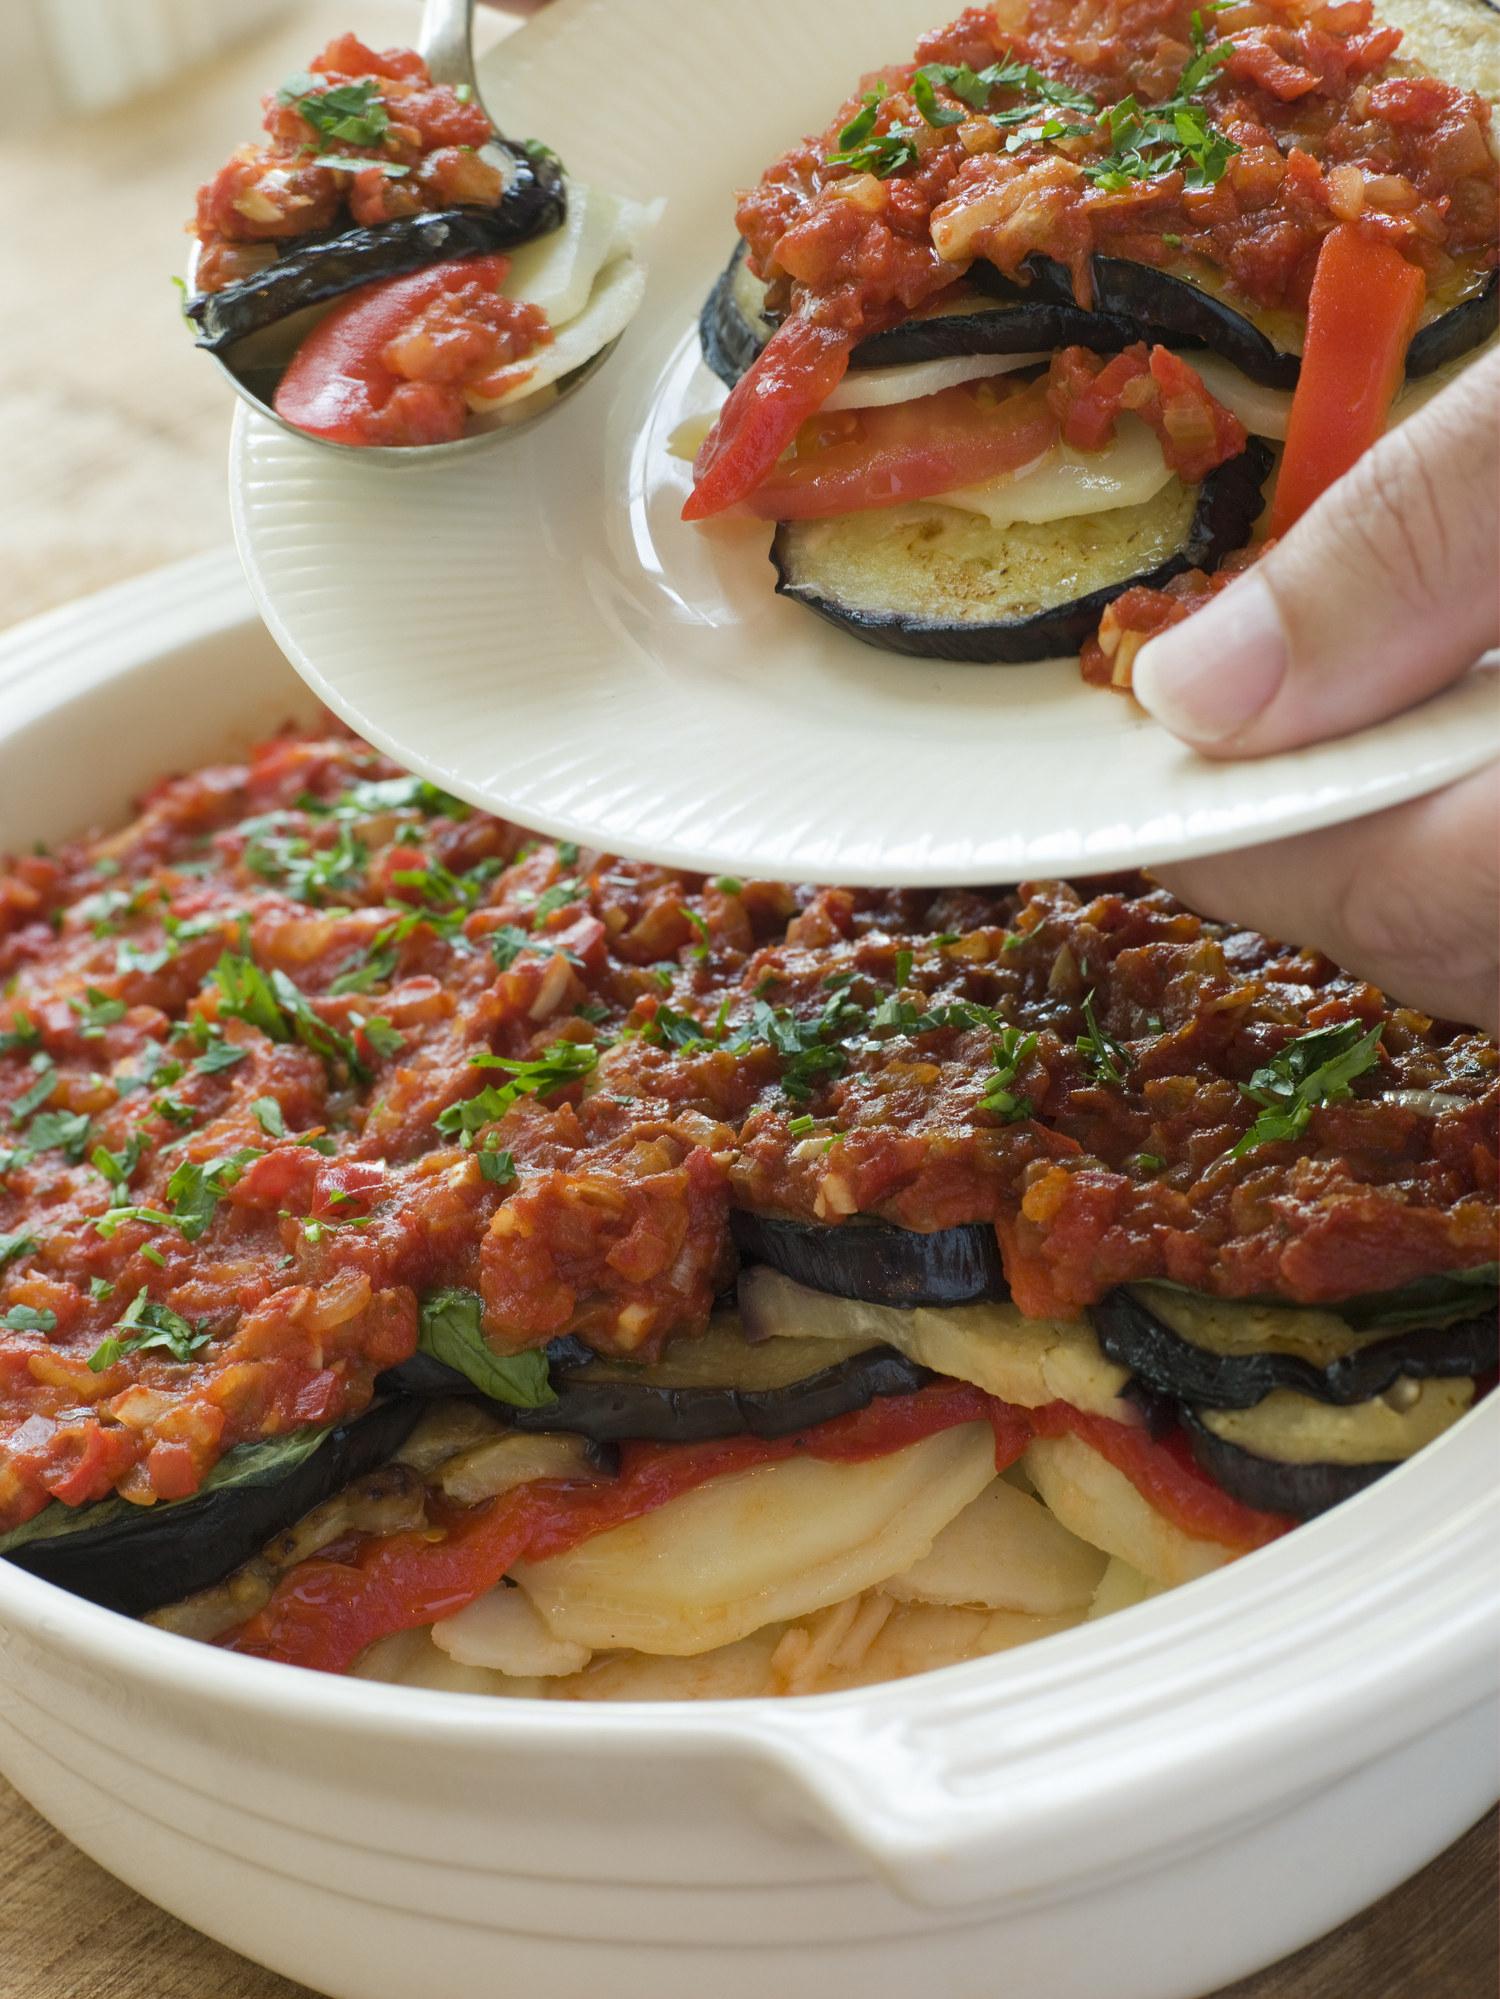 Tumbet aka eggplant layered with potato and tomato sauce.